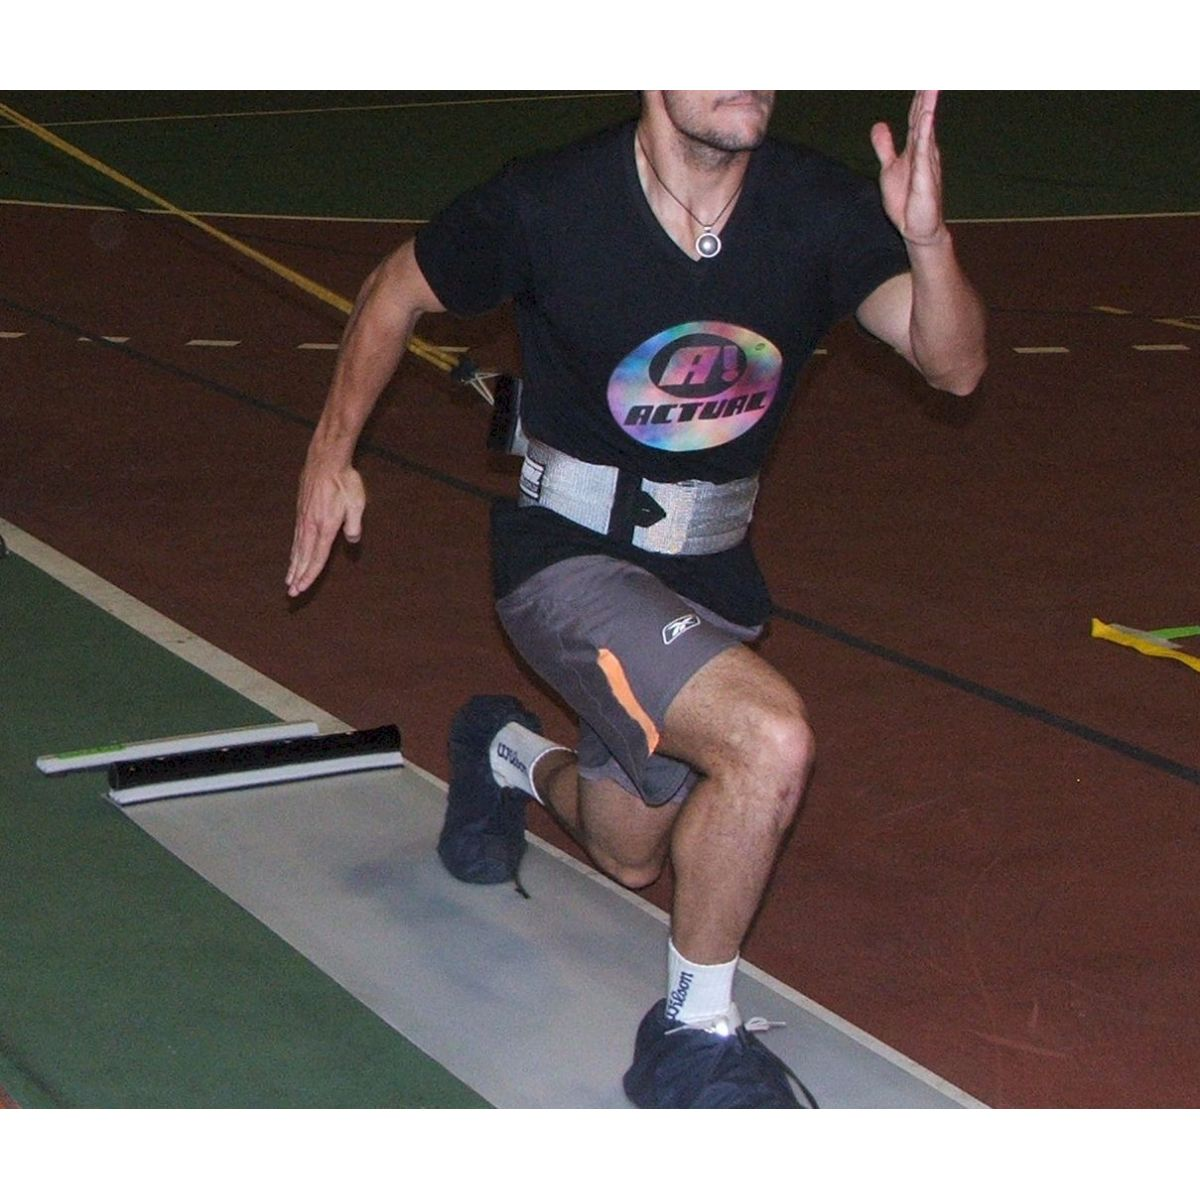 SLIDE - Pista de Deslizamento Profissional  - Actualsports  Equipamentos Esportivos